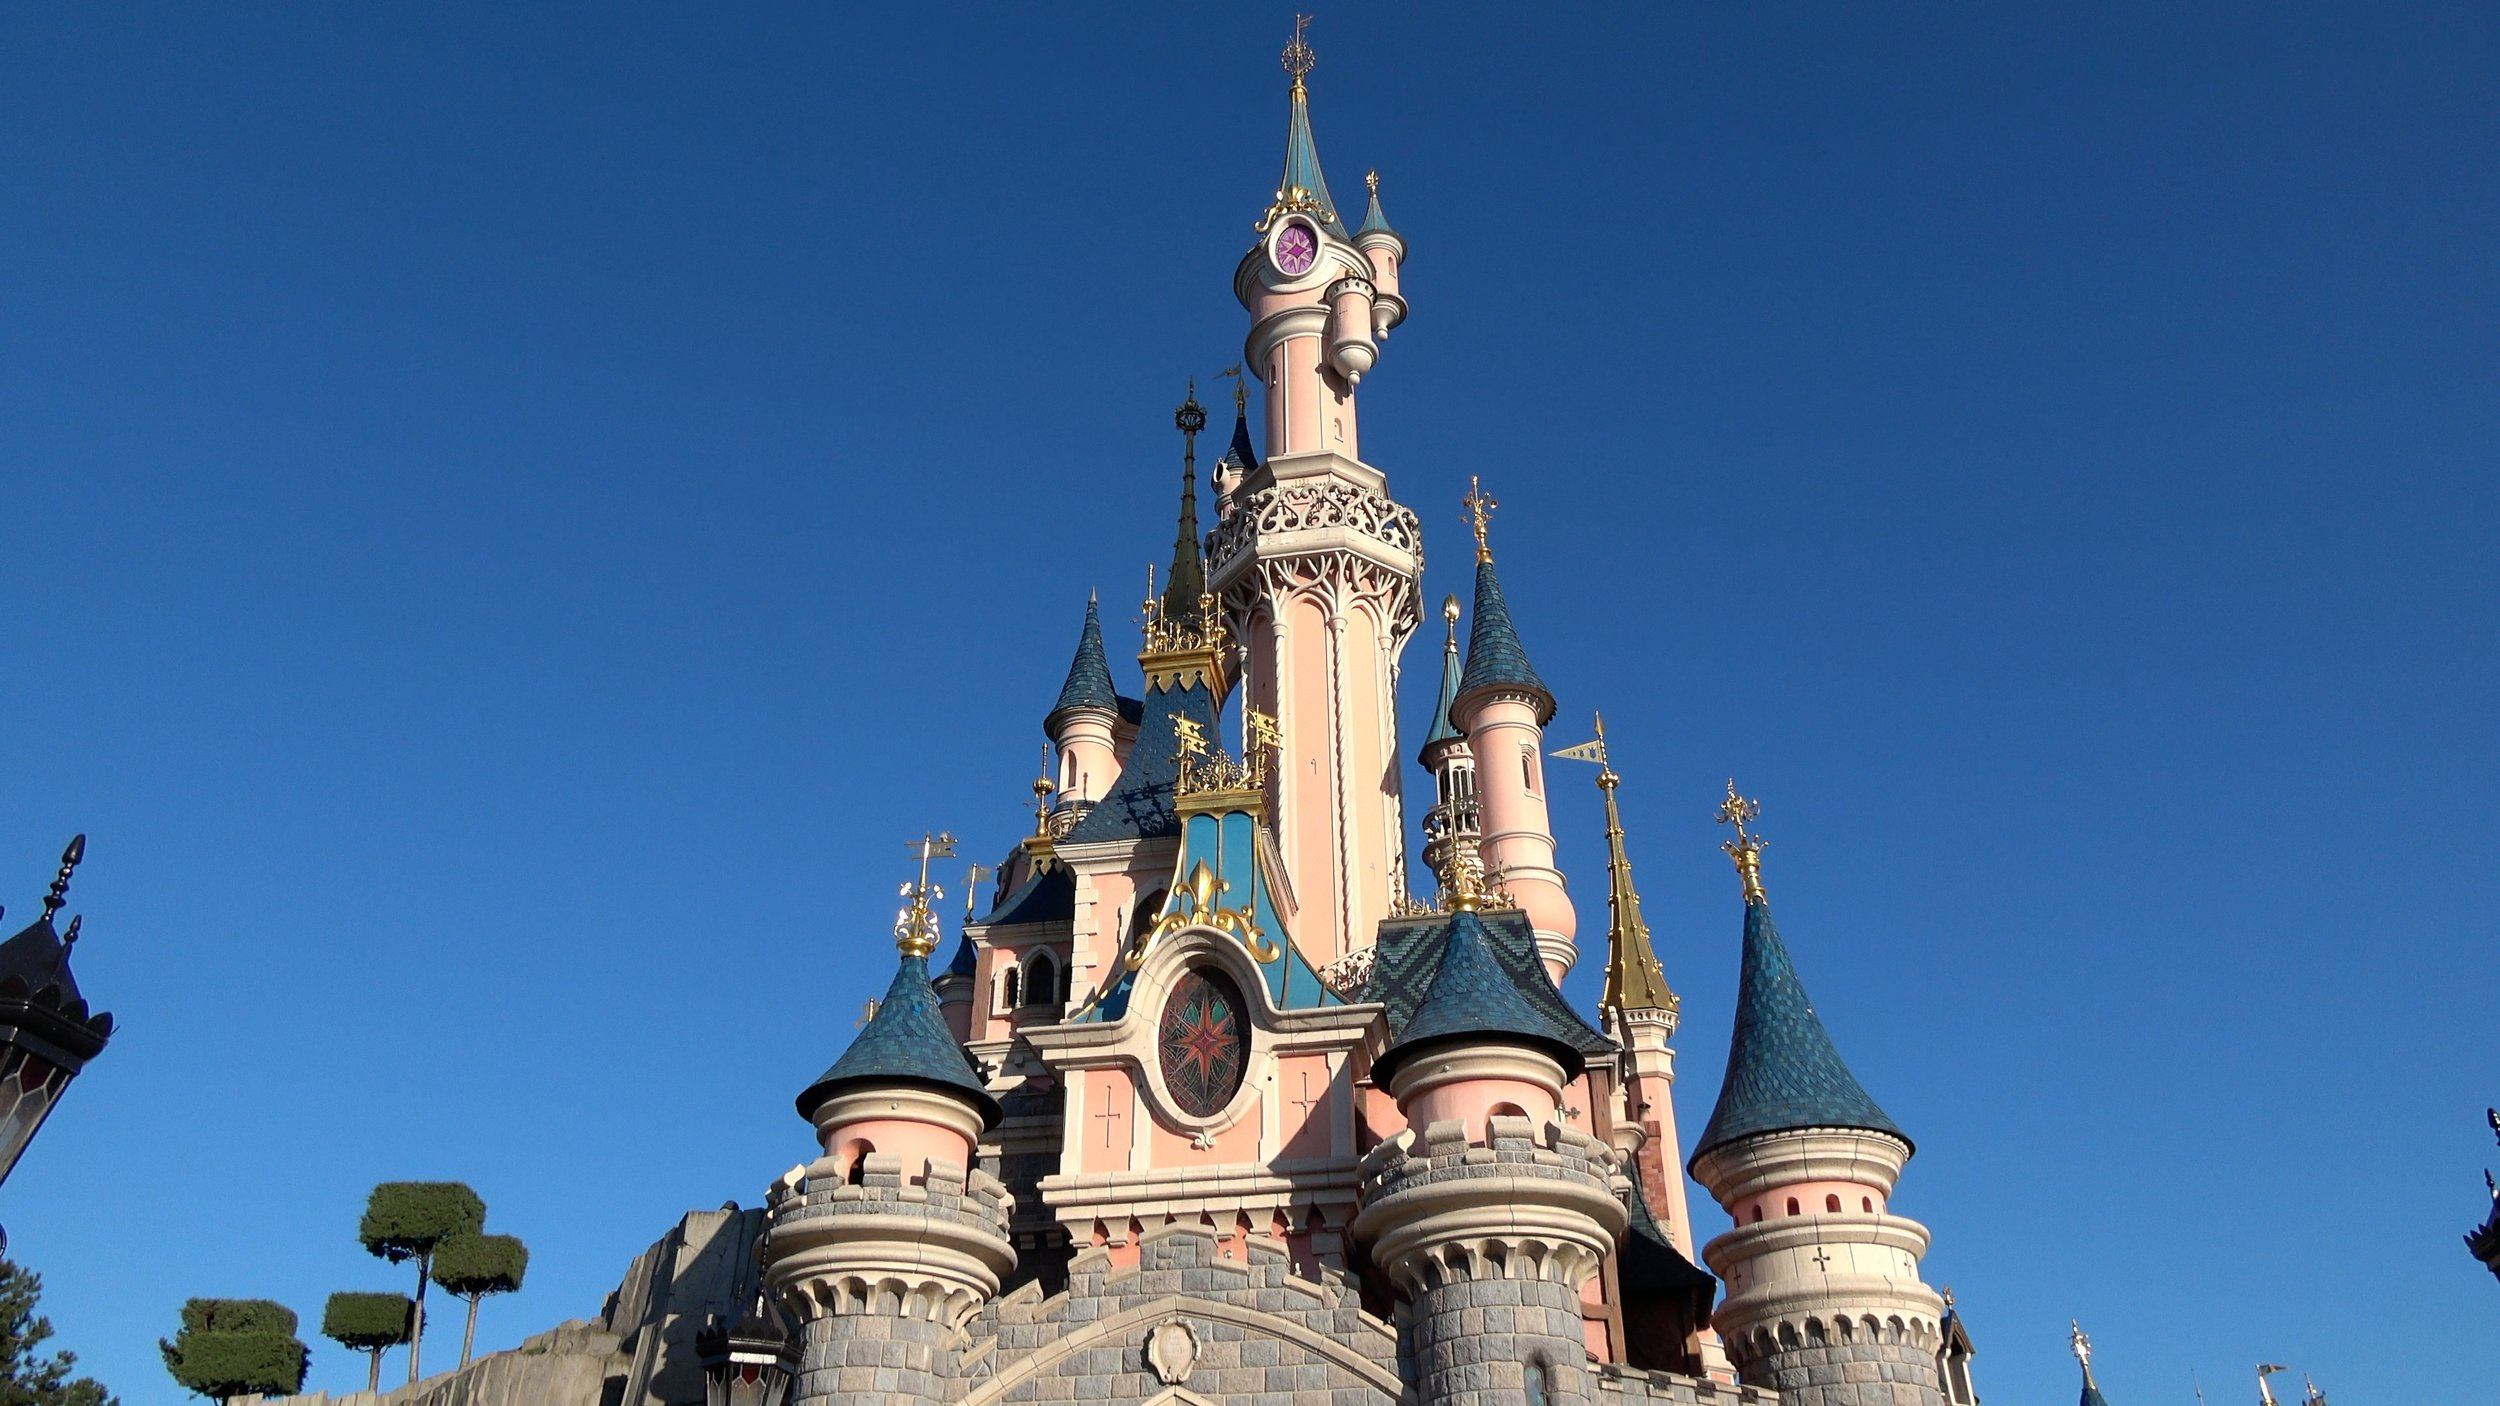 Disneyland Paris  A day at Disneyland Park.jpg